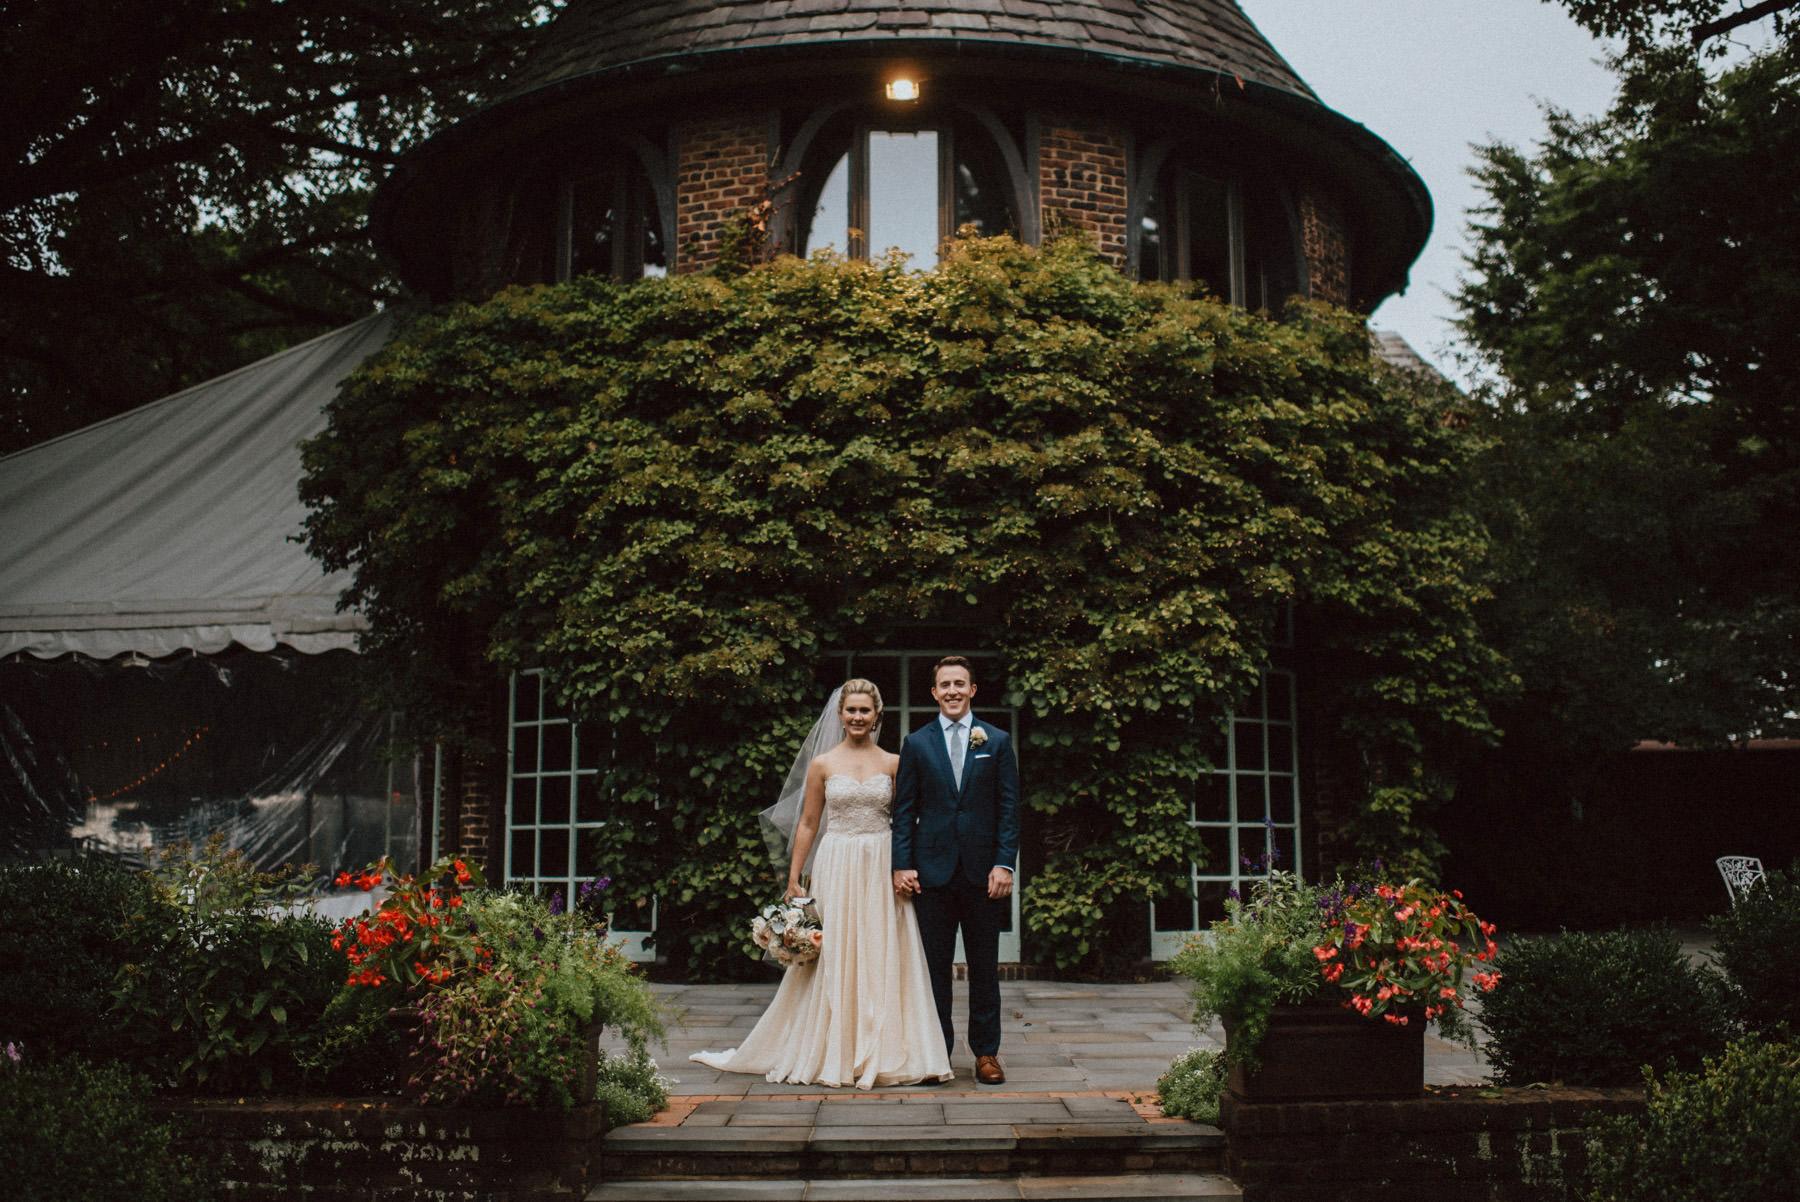 248-greenville-country-club-wedding-8-2.jpg